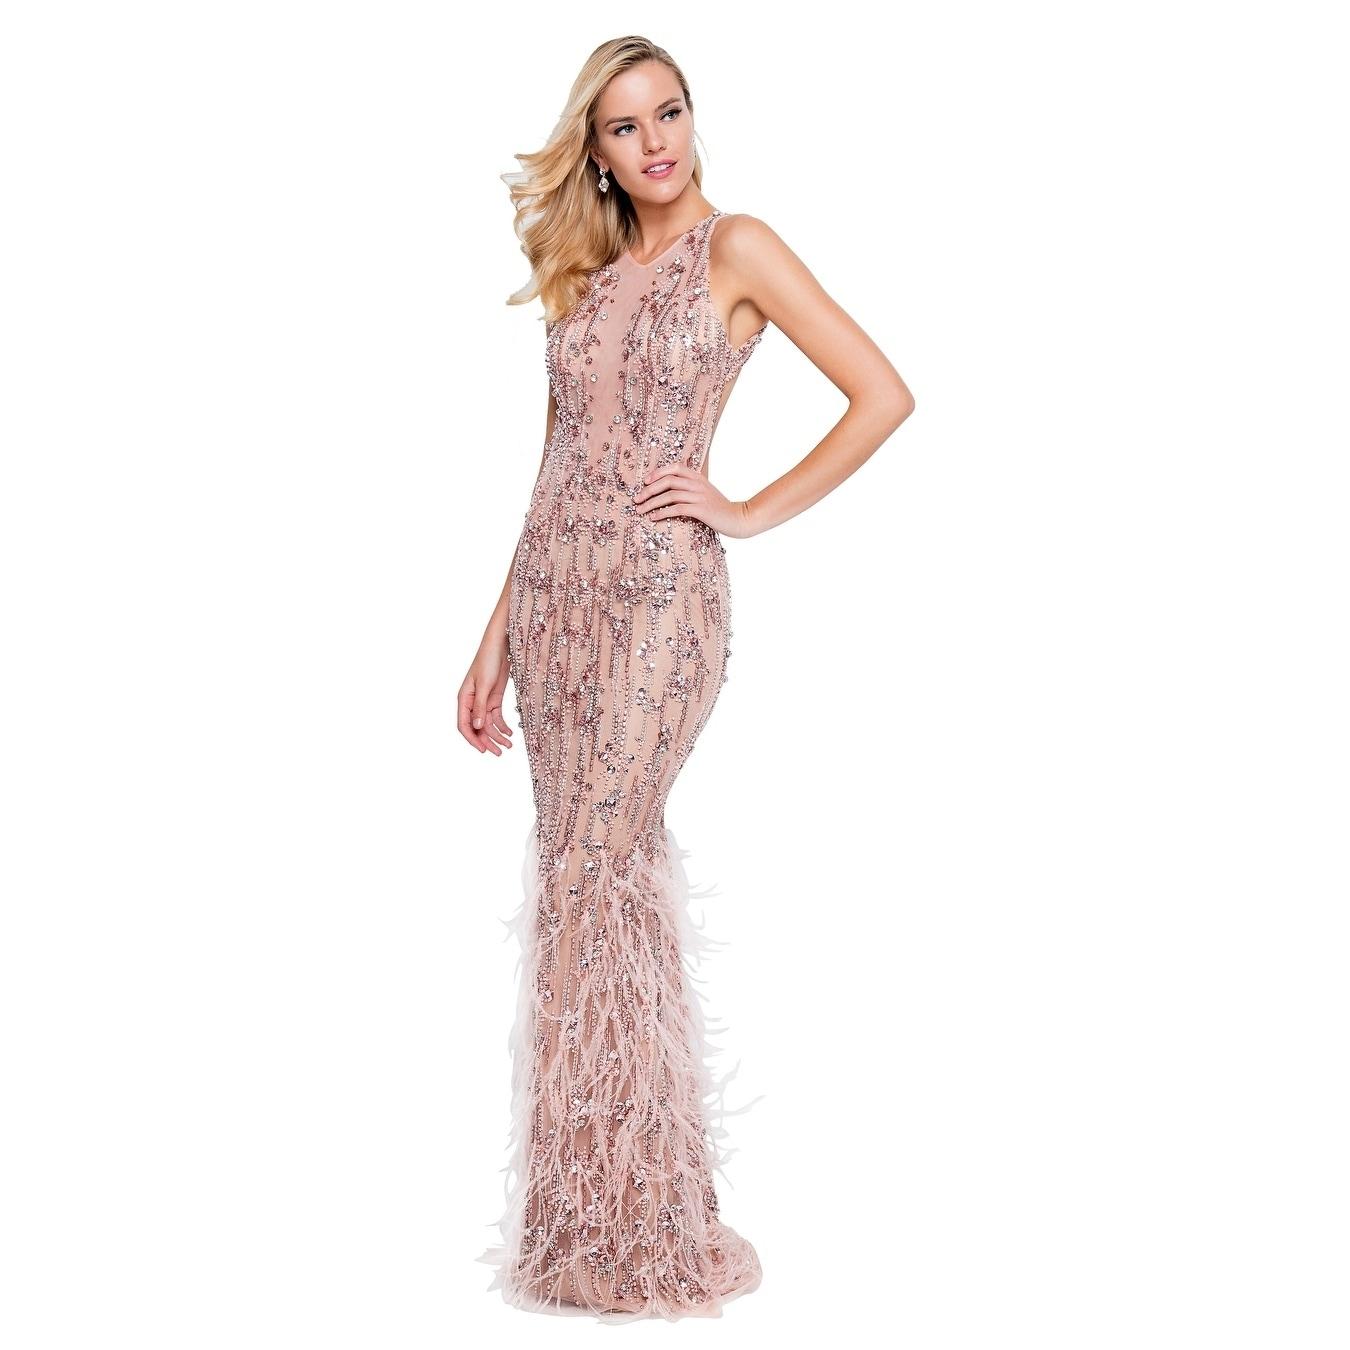 a7f86f4f8d8 Amazon.com  terani couture dresses. Terani Couture High-Neck Beaded Bodice  ...